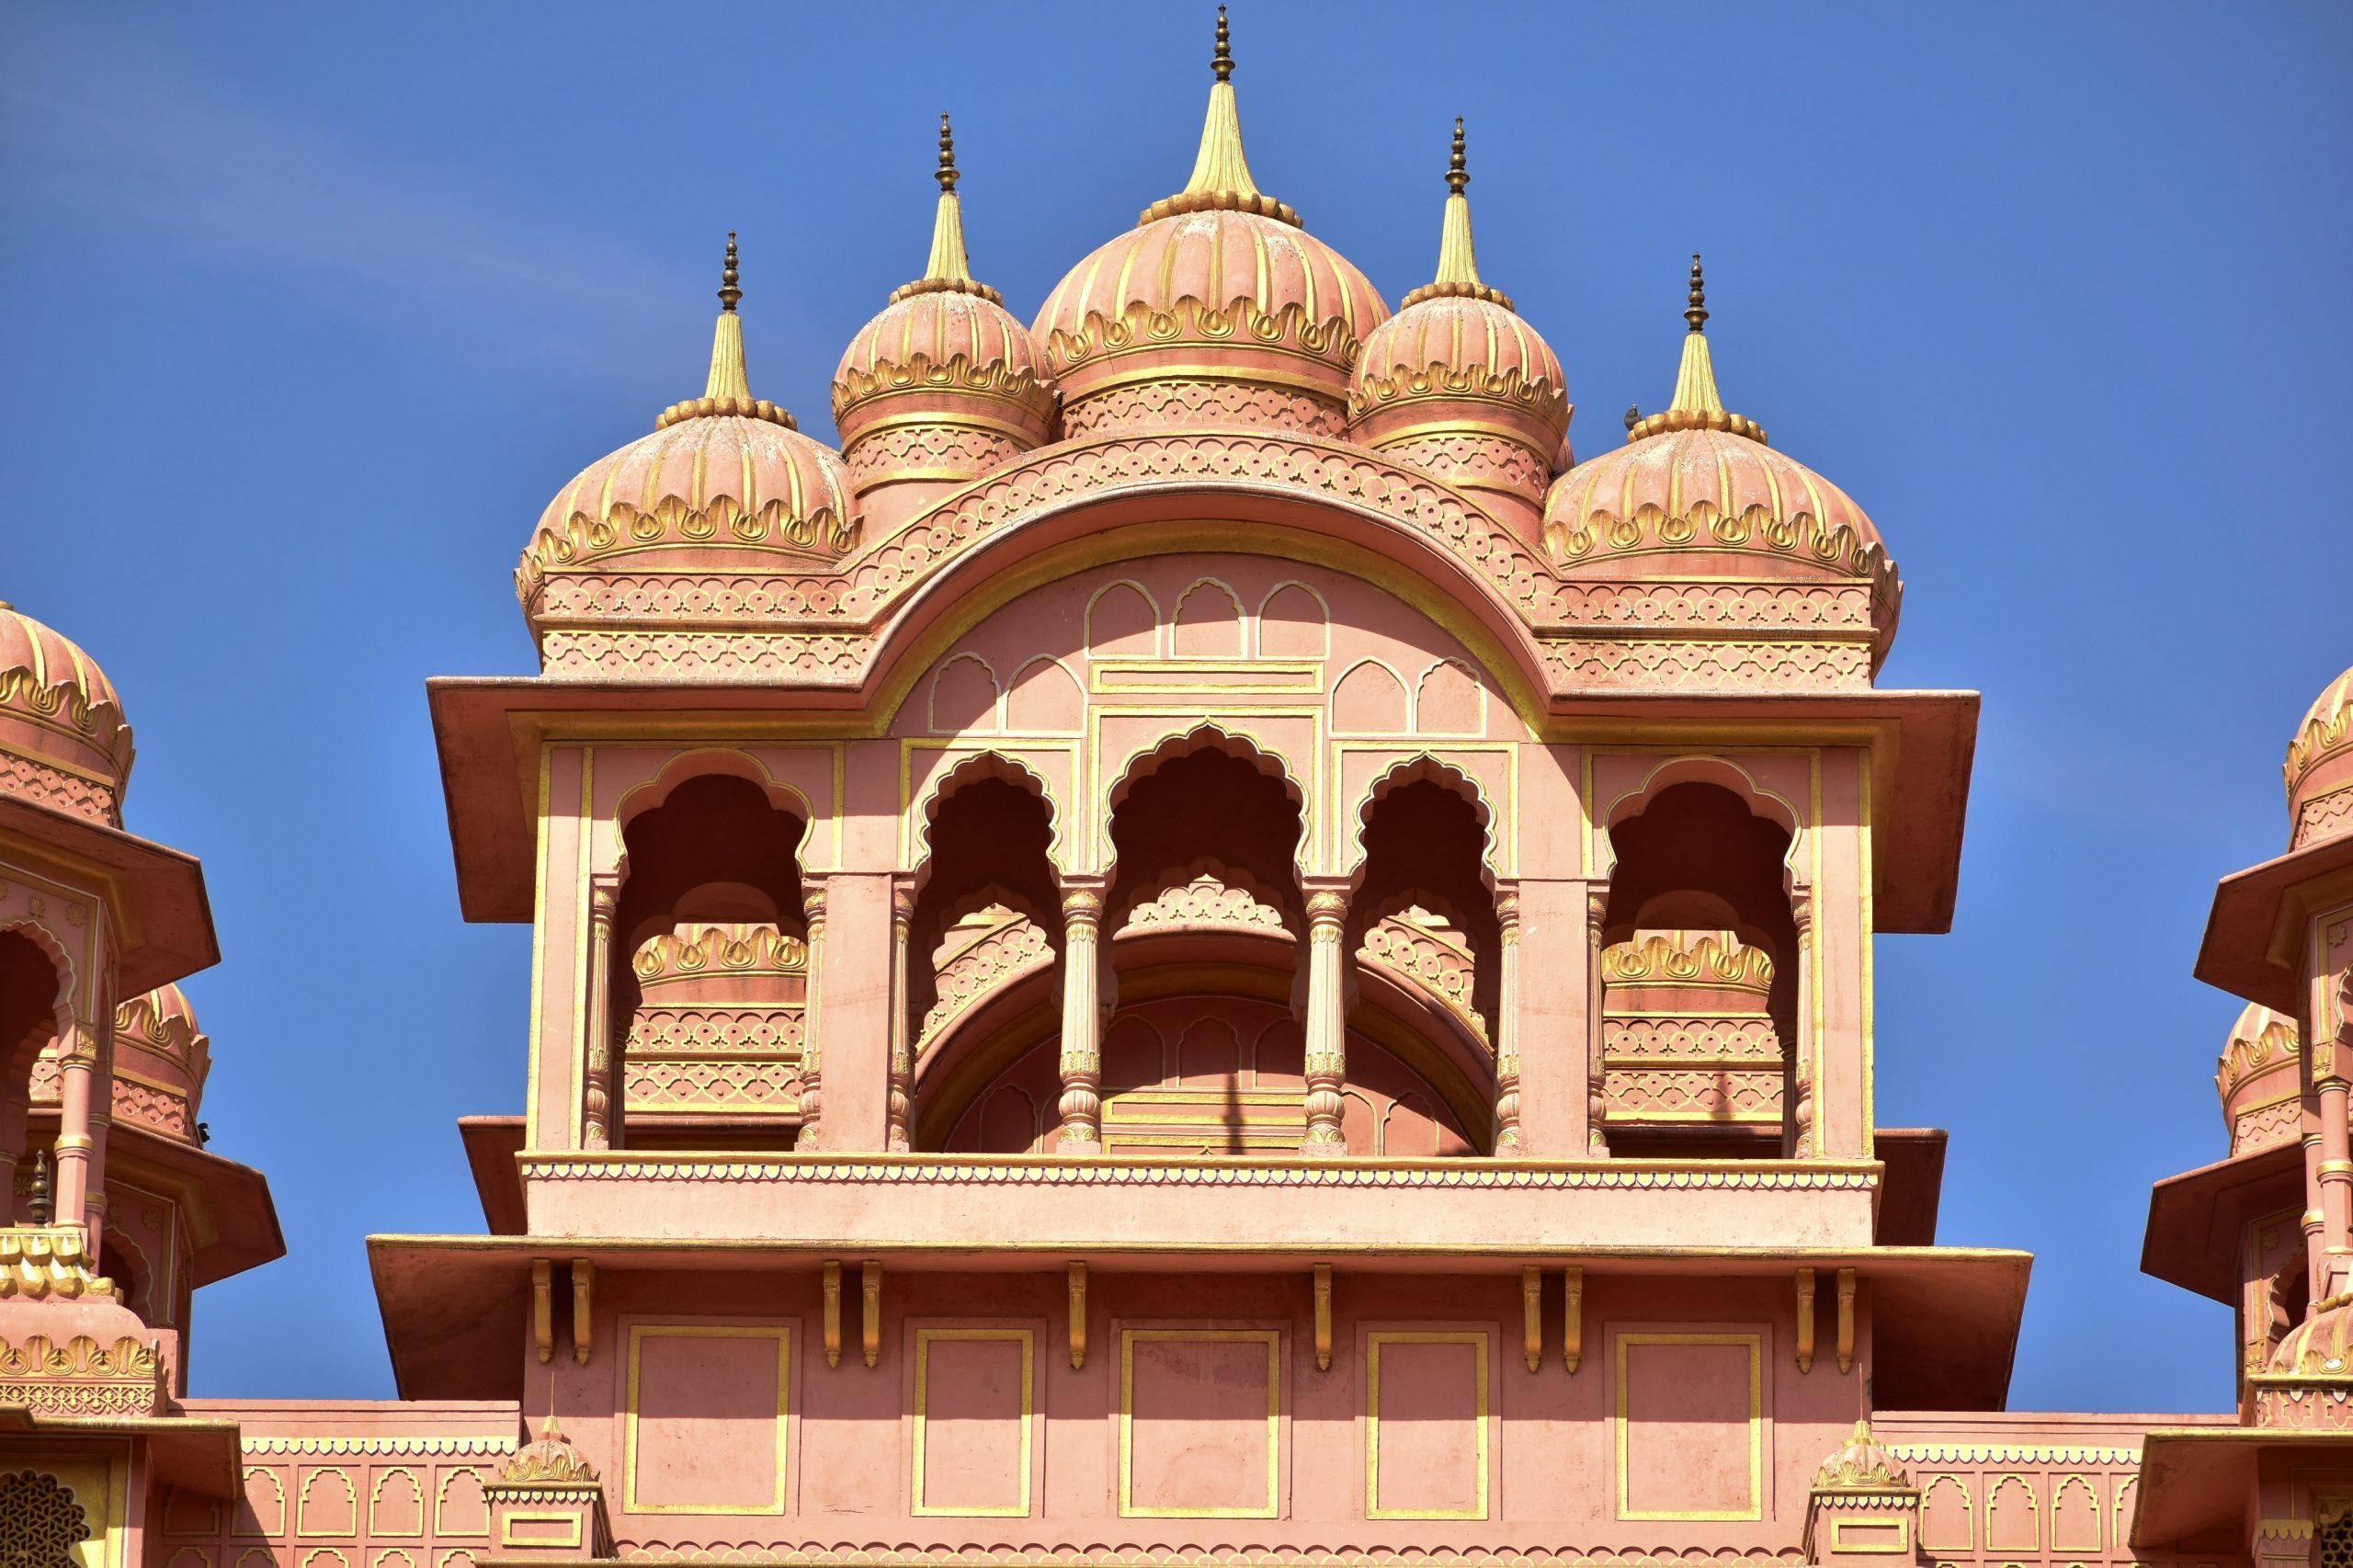 Domes of Patrika gate in Jaipur